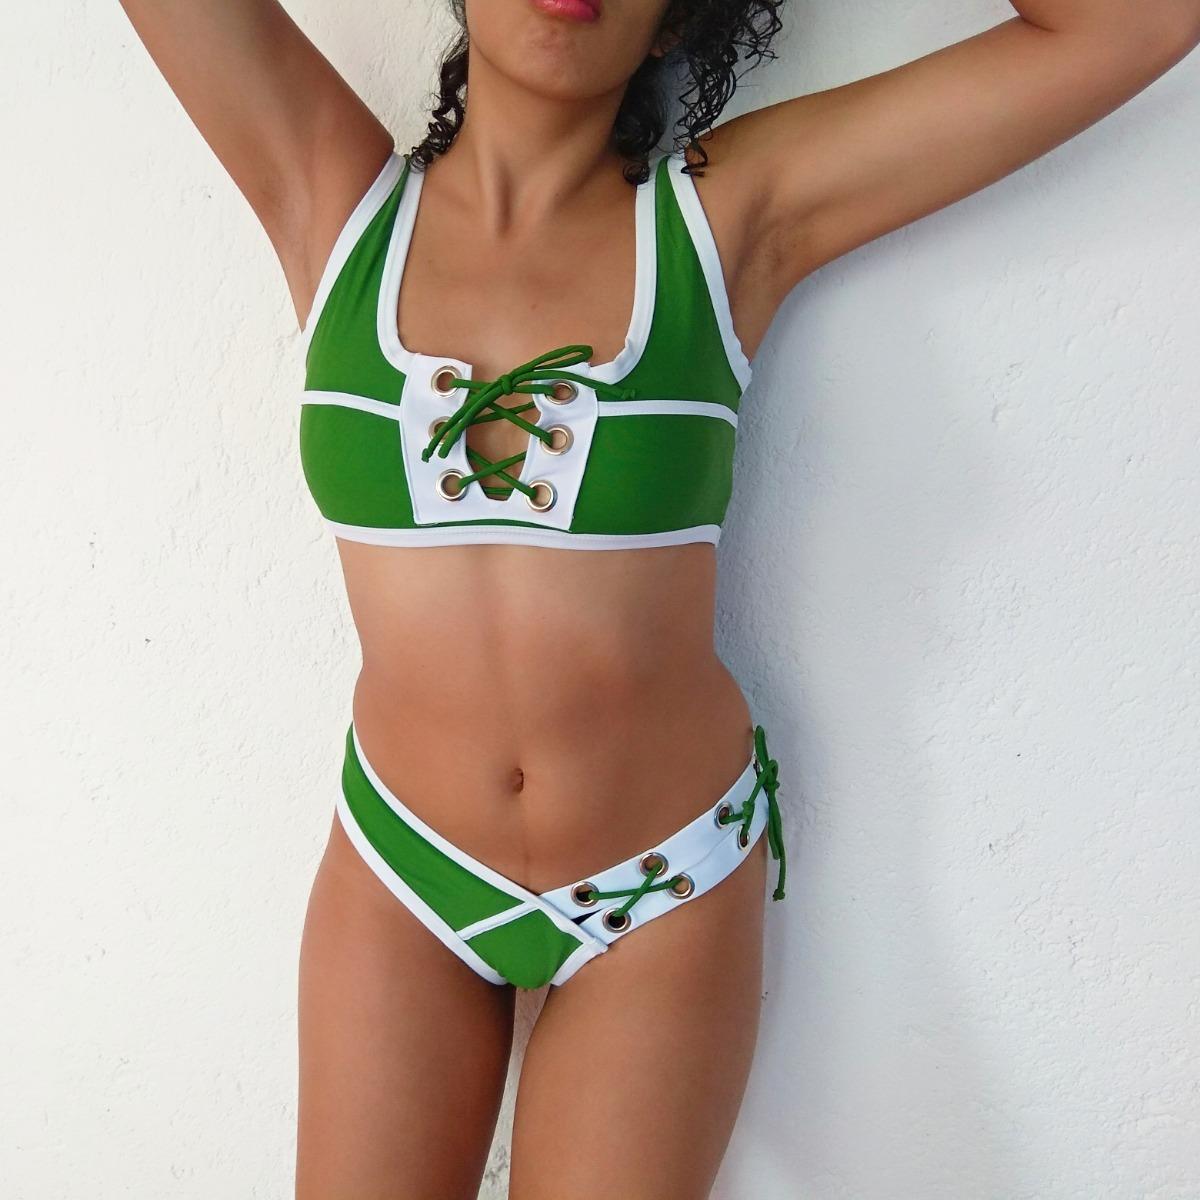 4912b9aadfb3 Traje De Baño Mujeres Crop Top Bikini Ropa Playa Mujer